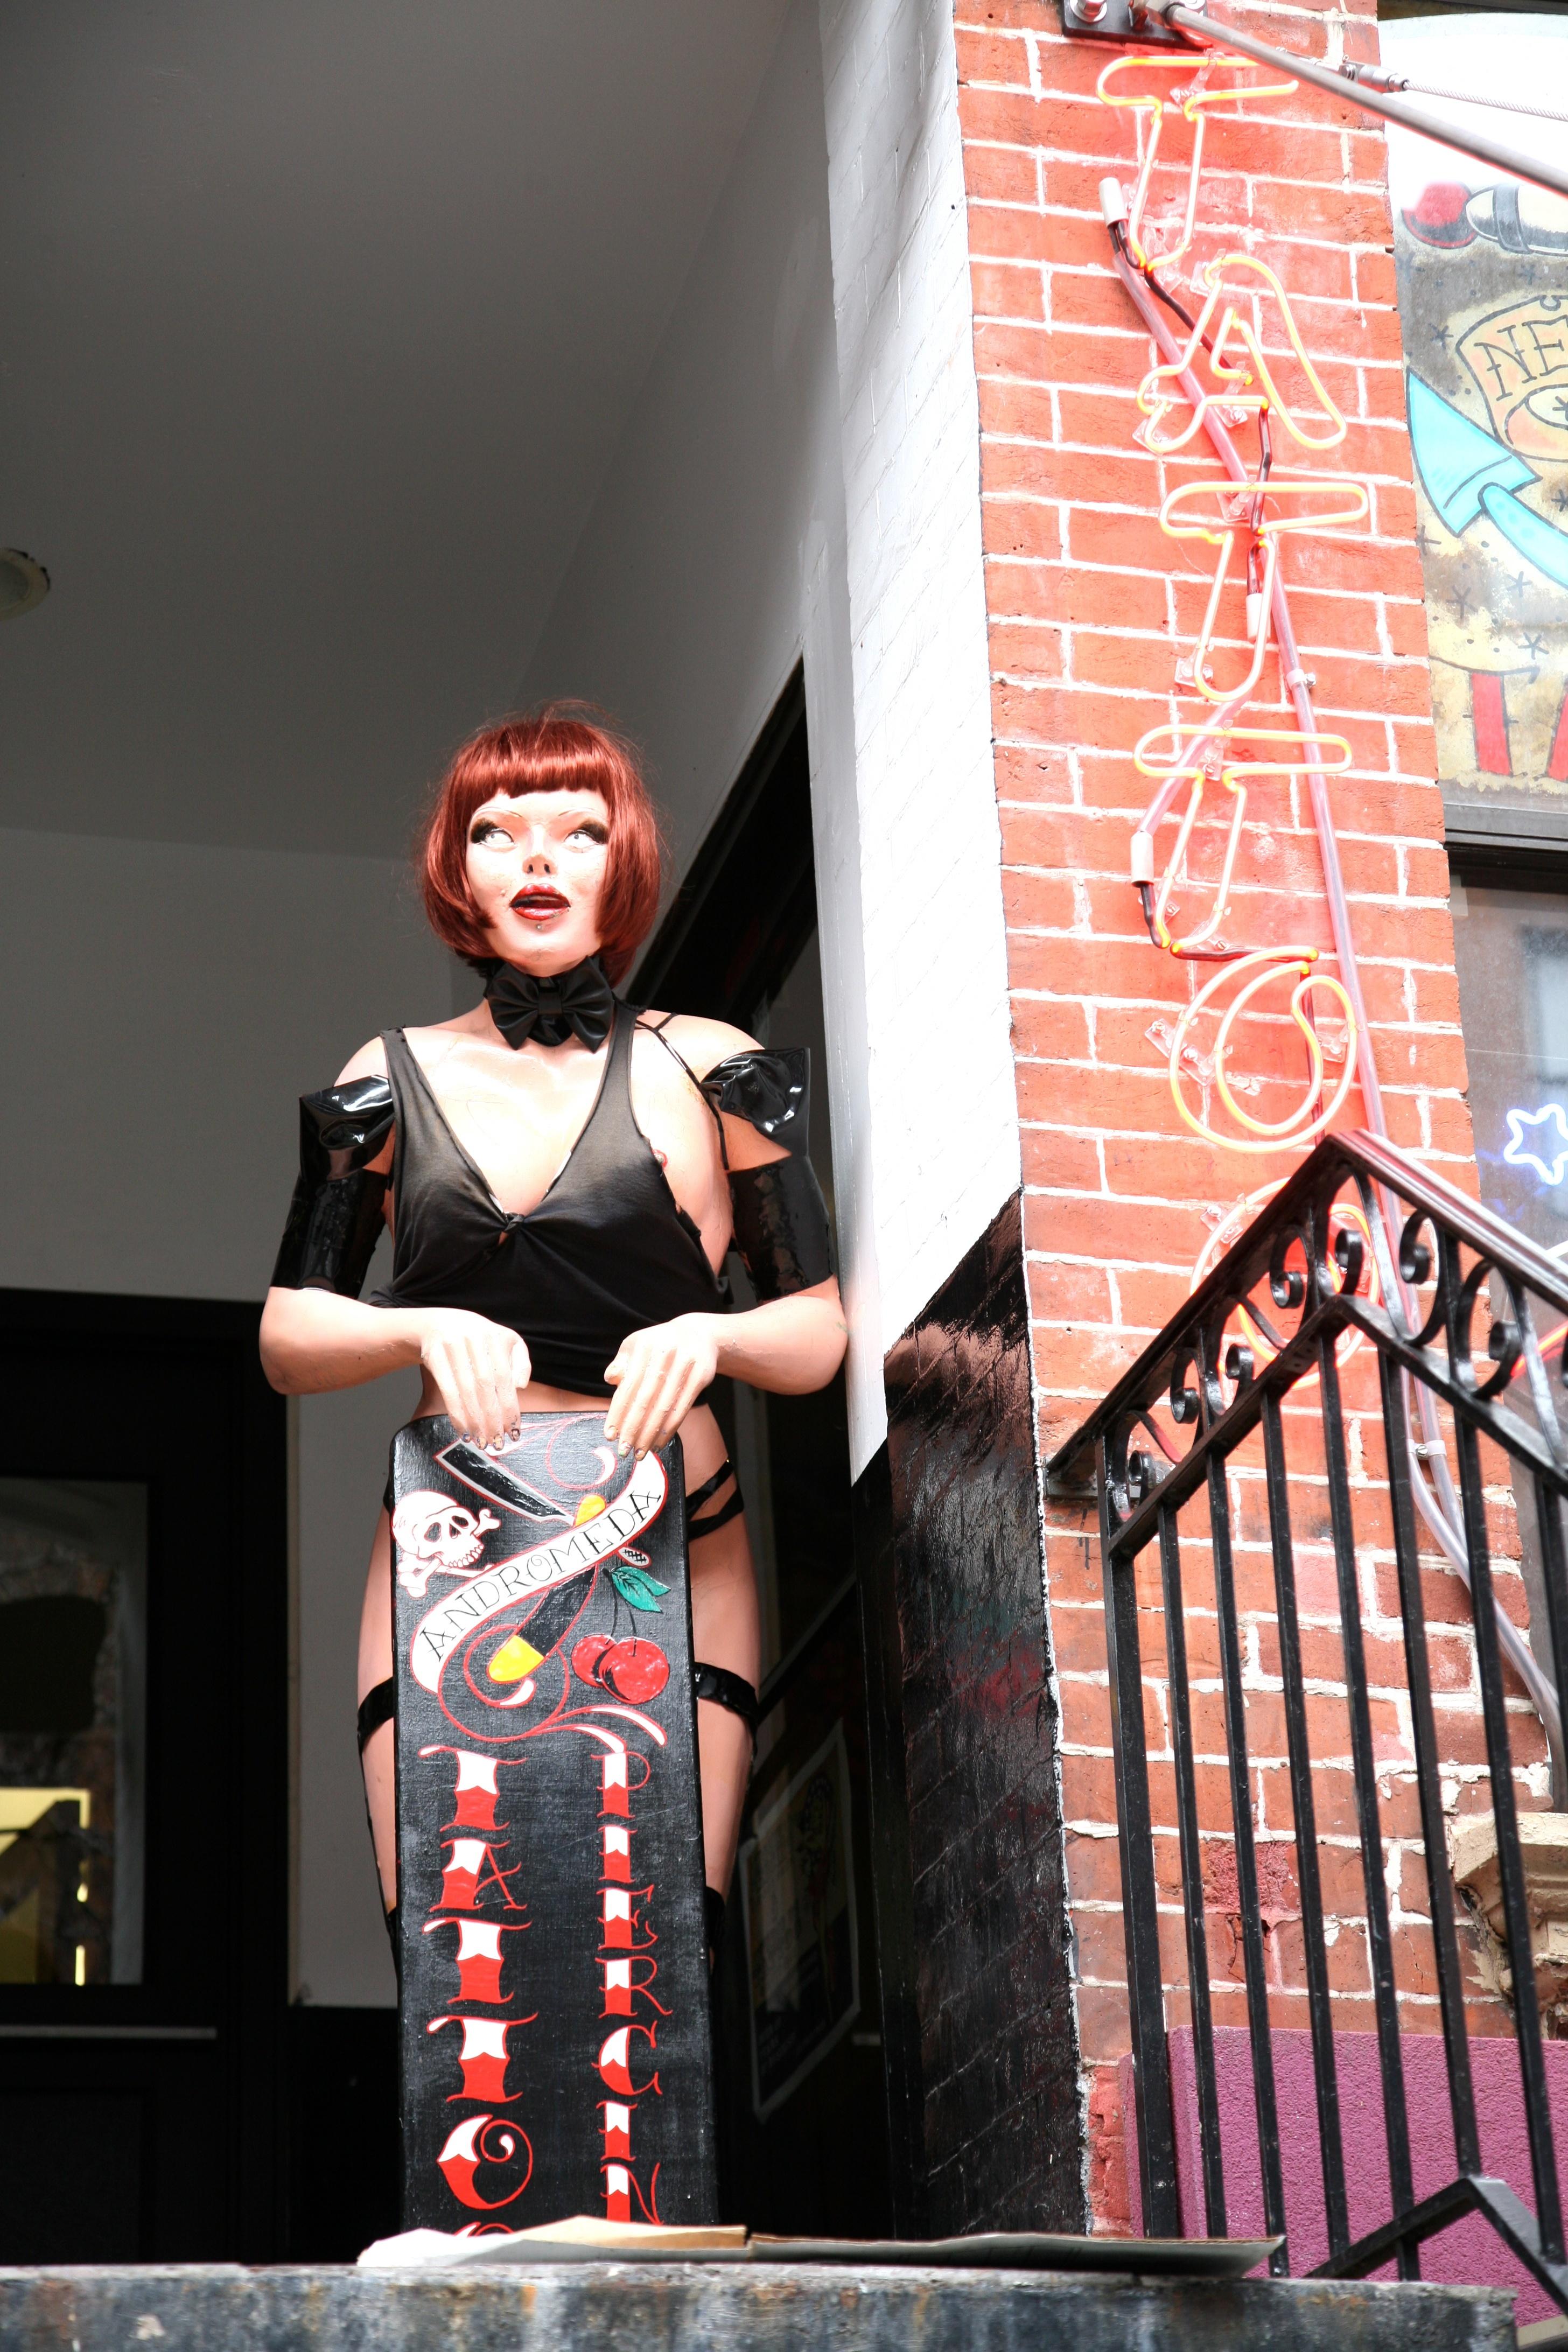 Images Gratuites Manhattan Tatouage Nyc Vetements Percant Art